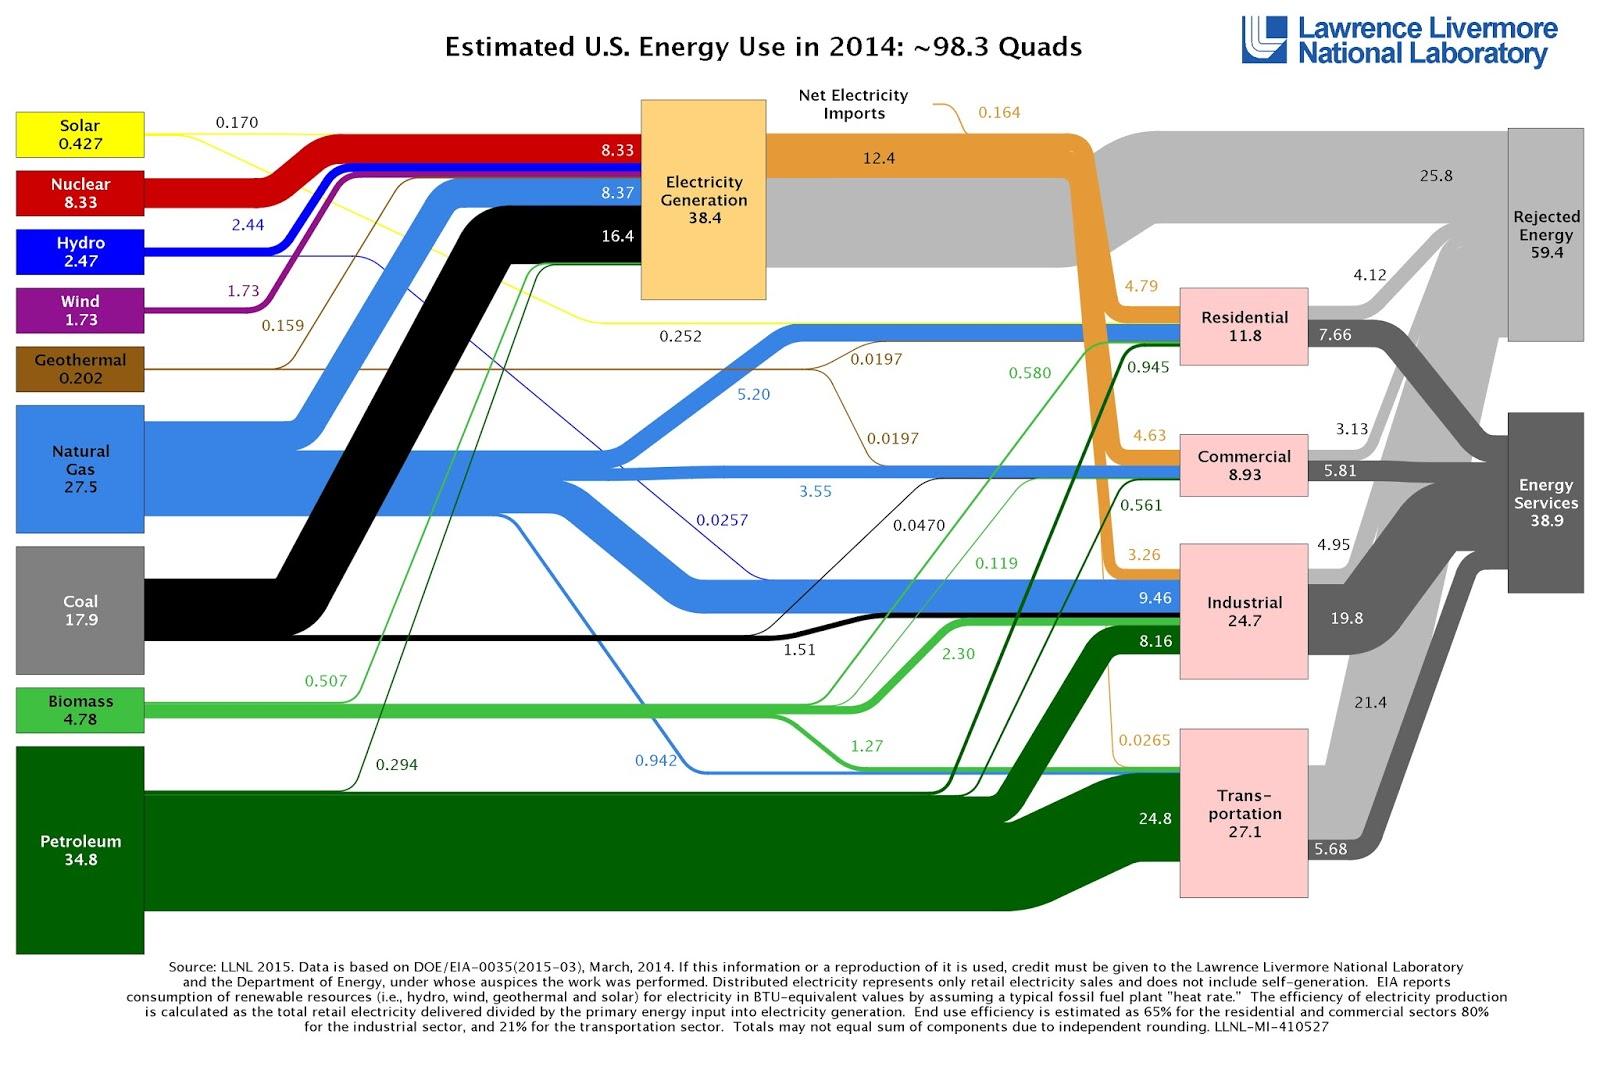 Estimated US energy use